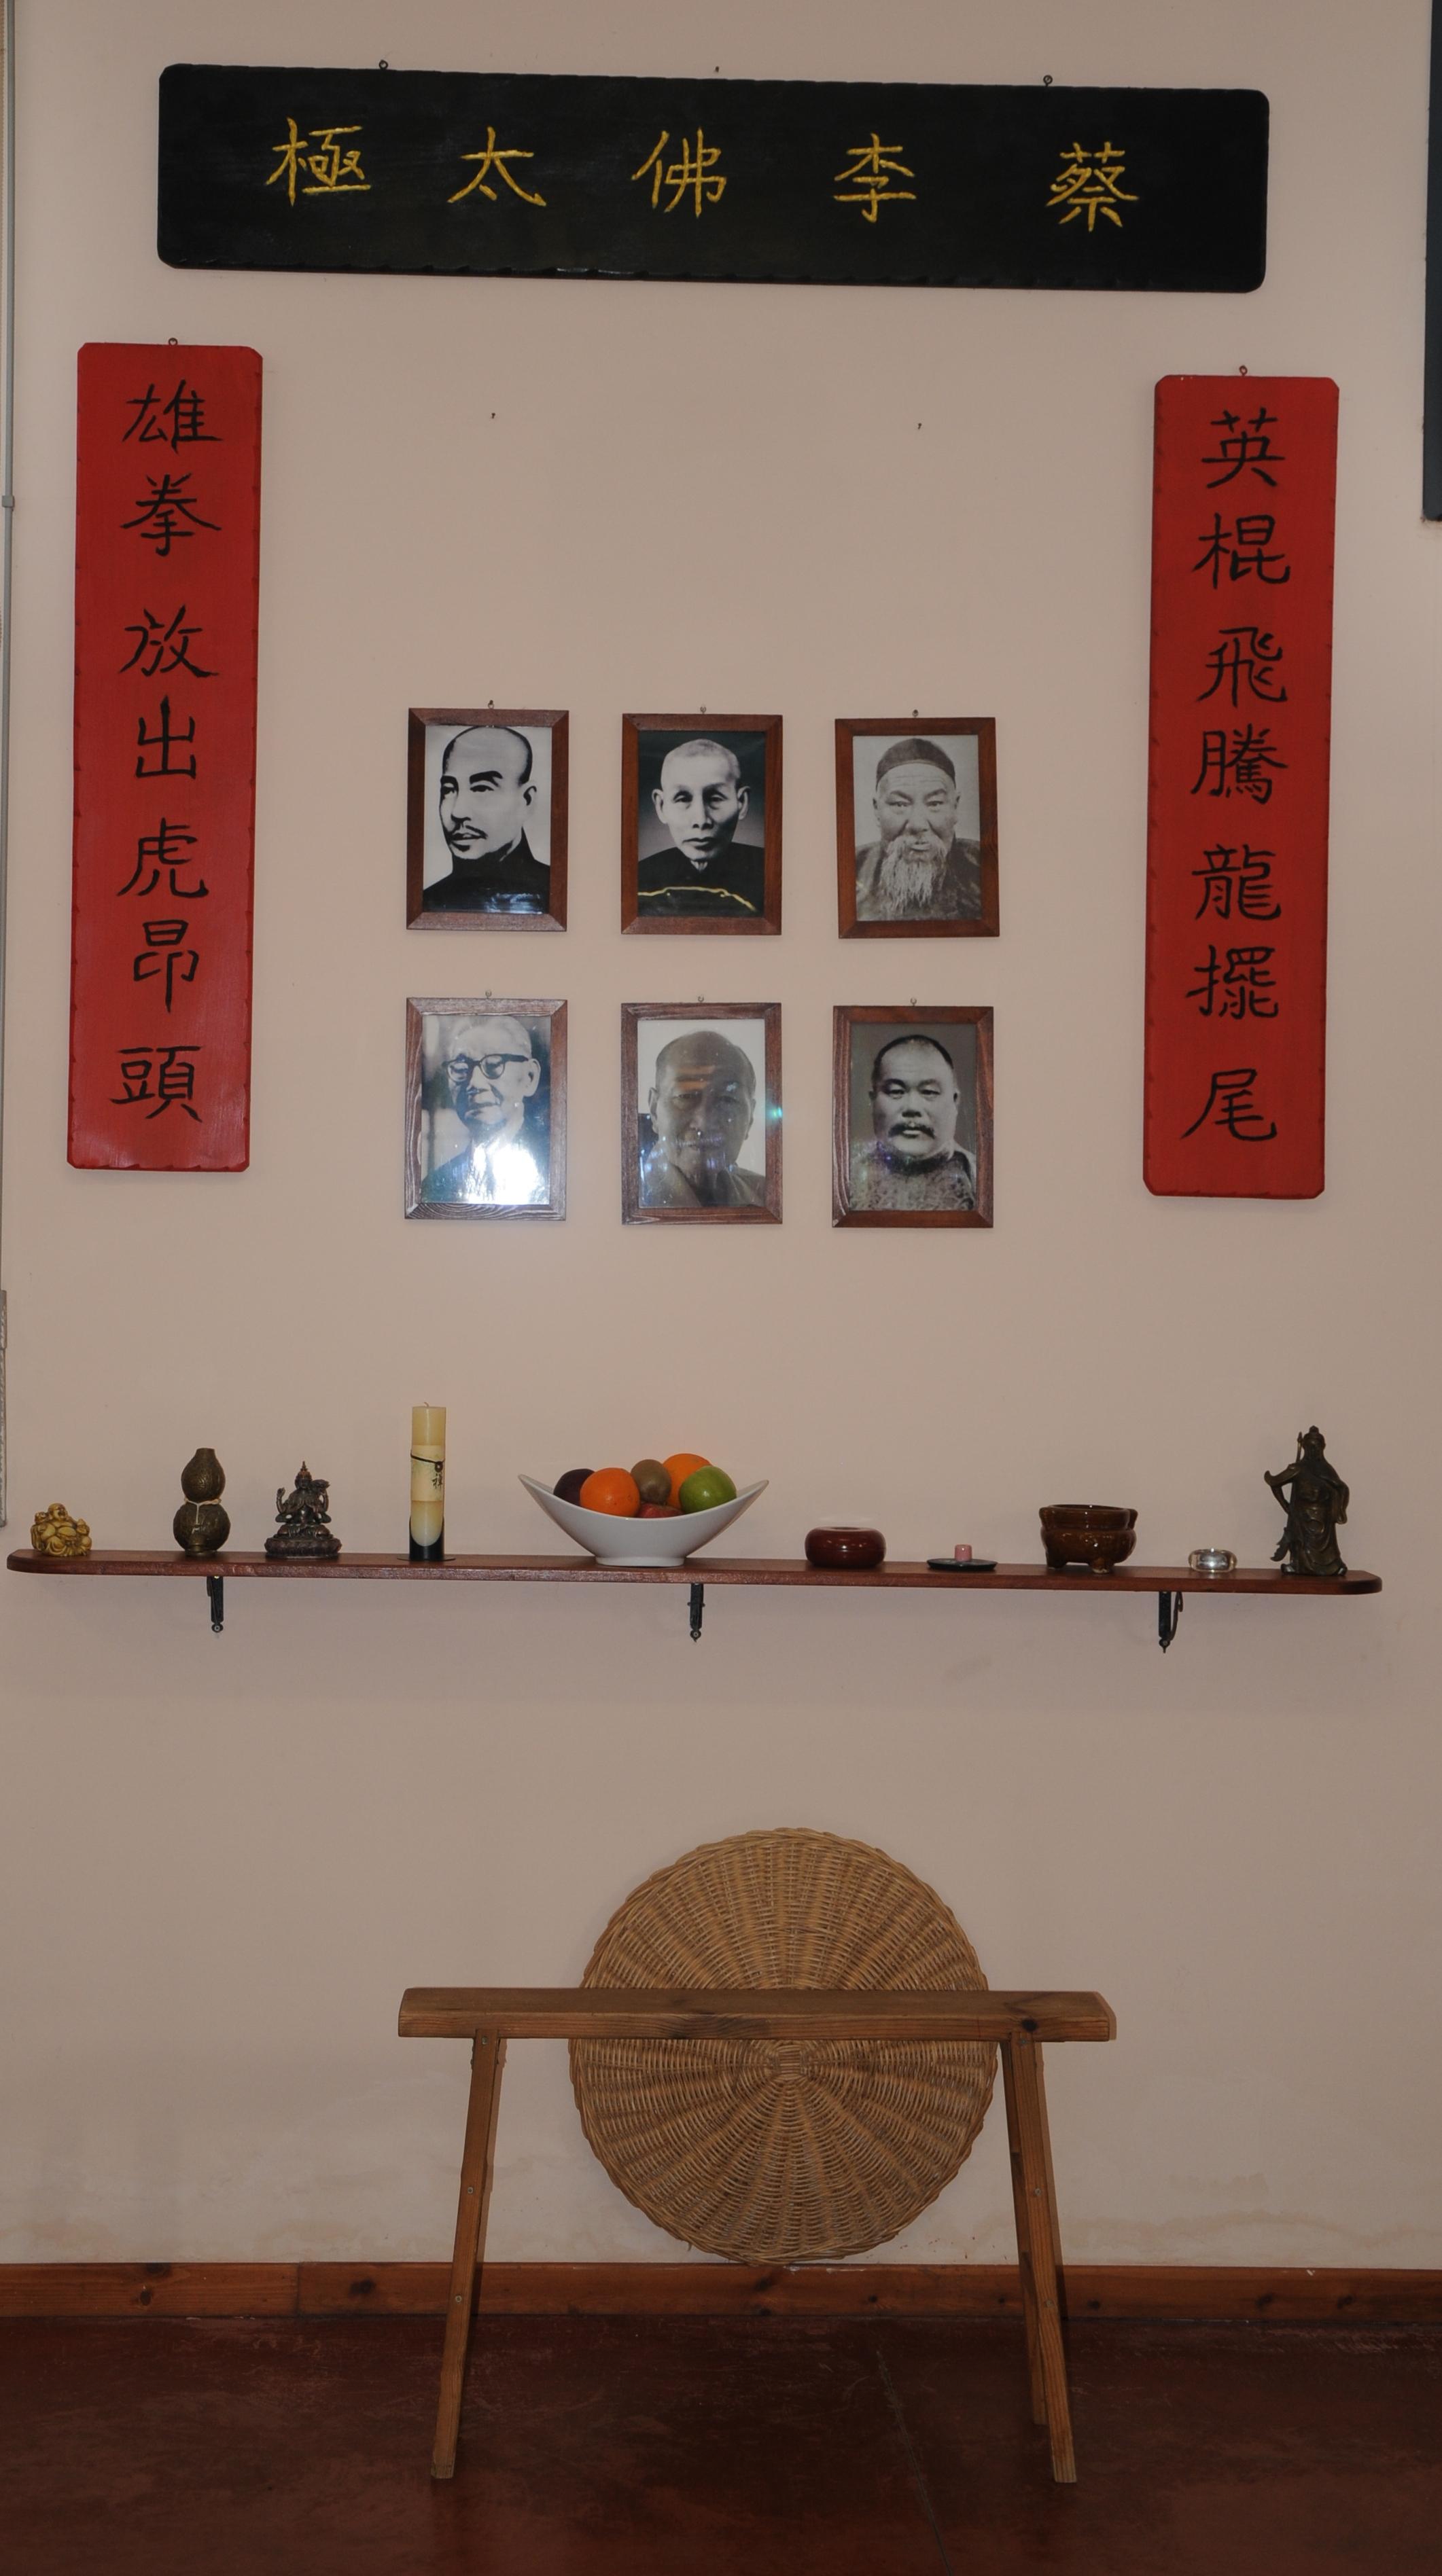 Altare Choy Li Fut